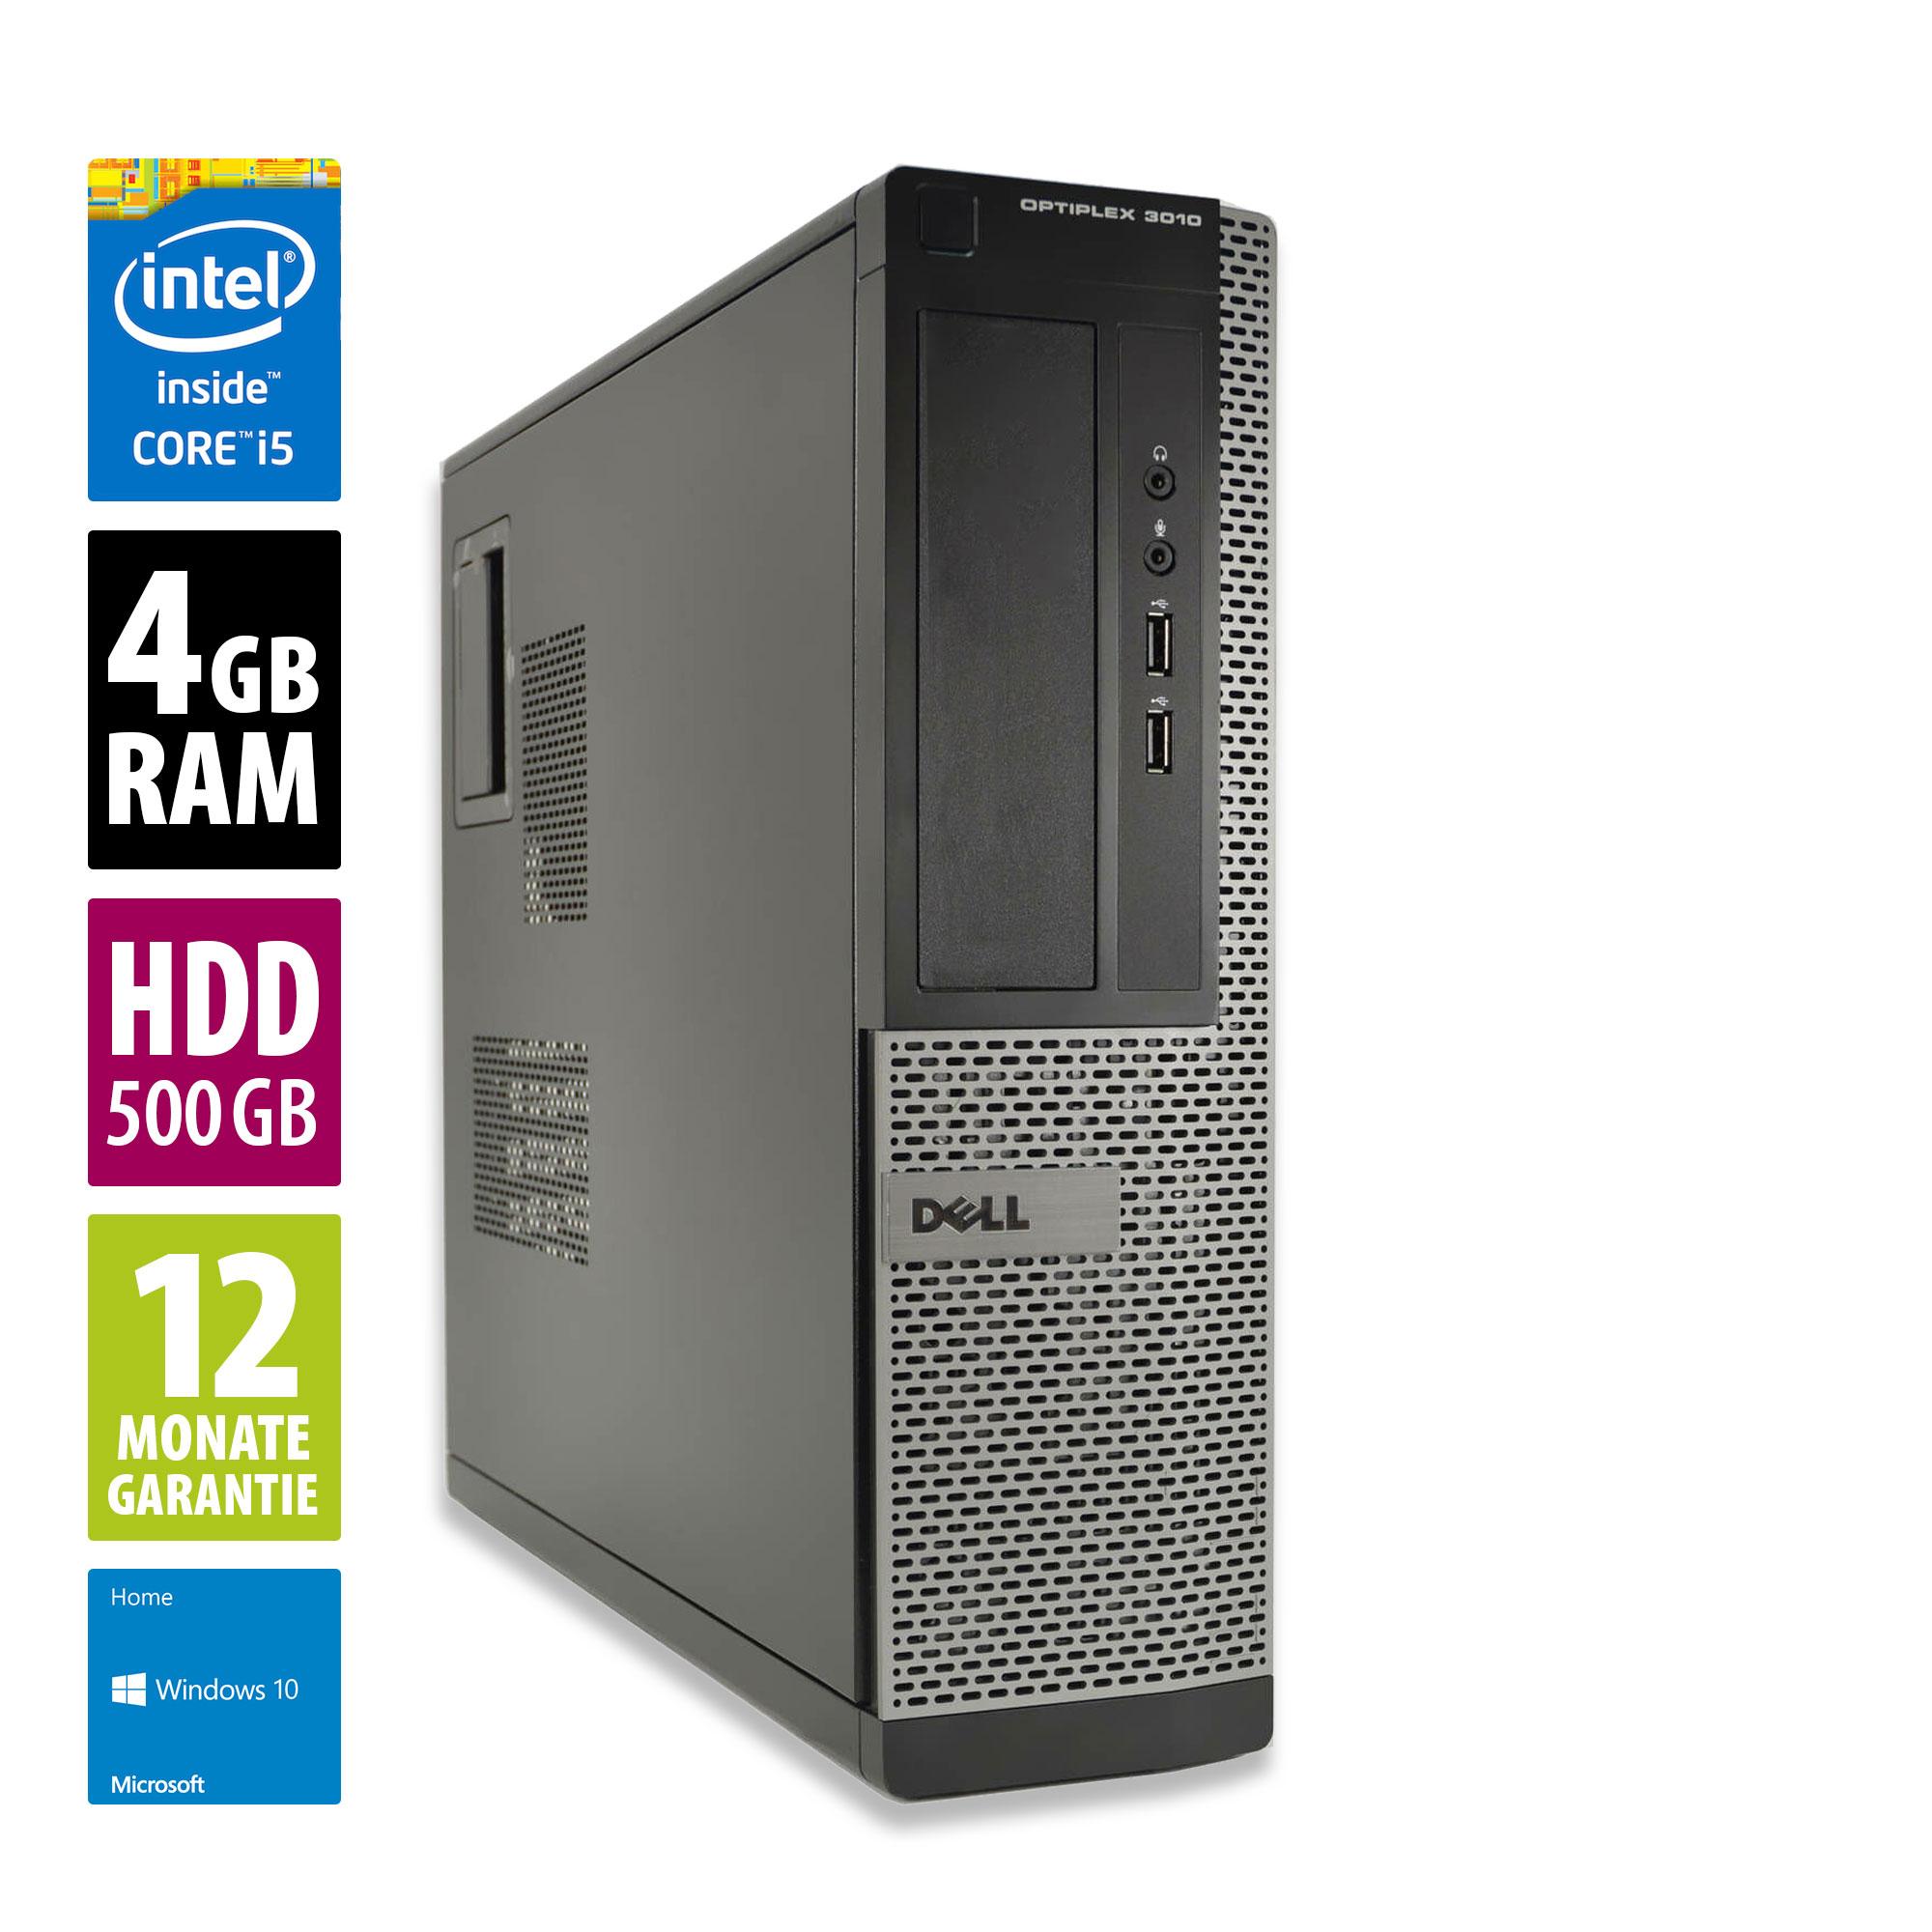 Refurbished - Dell OptiPlex 3010 DT - Core i5-3470 @ 3,2 GHz - 4GB RAM - 500GB HDD